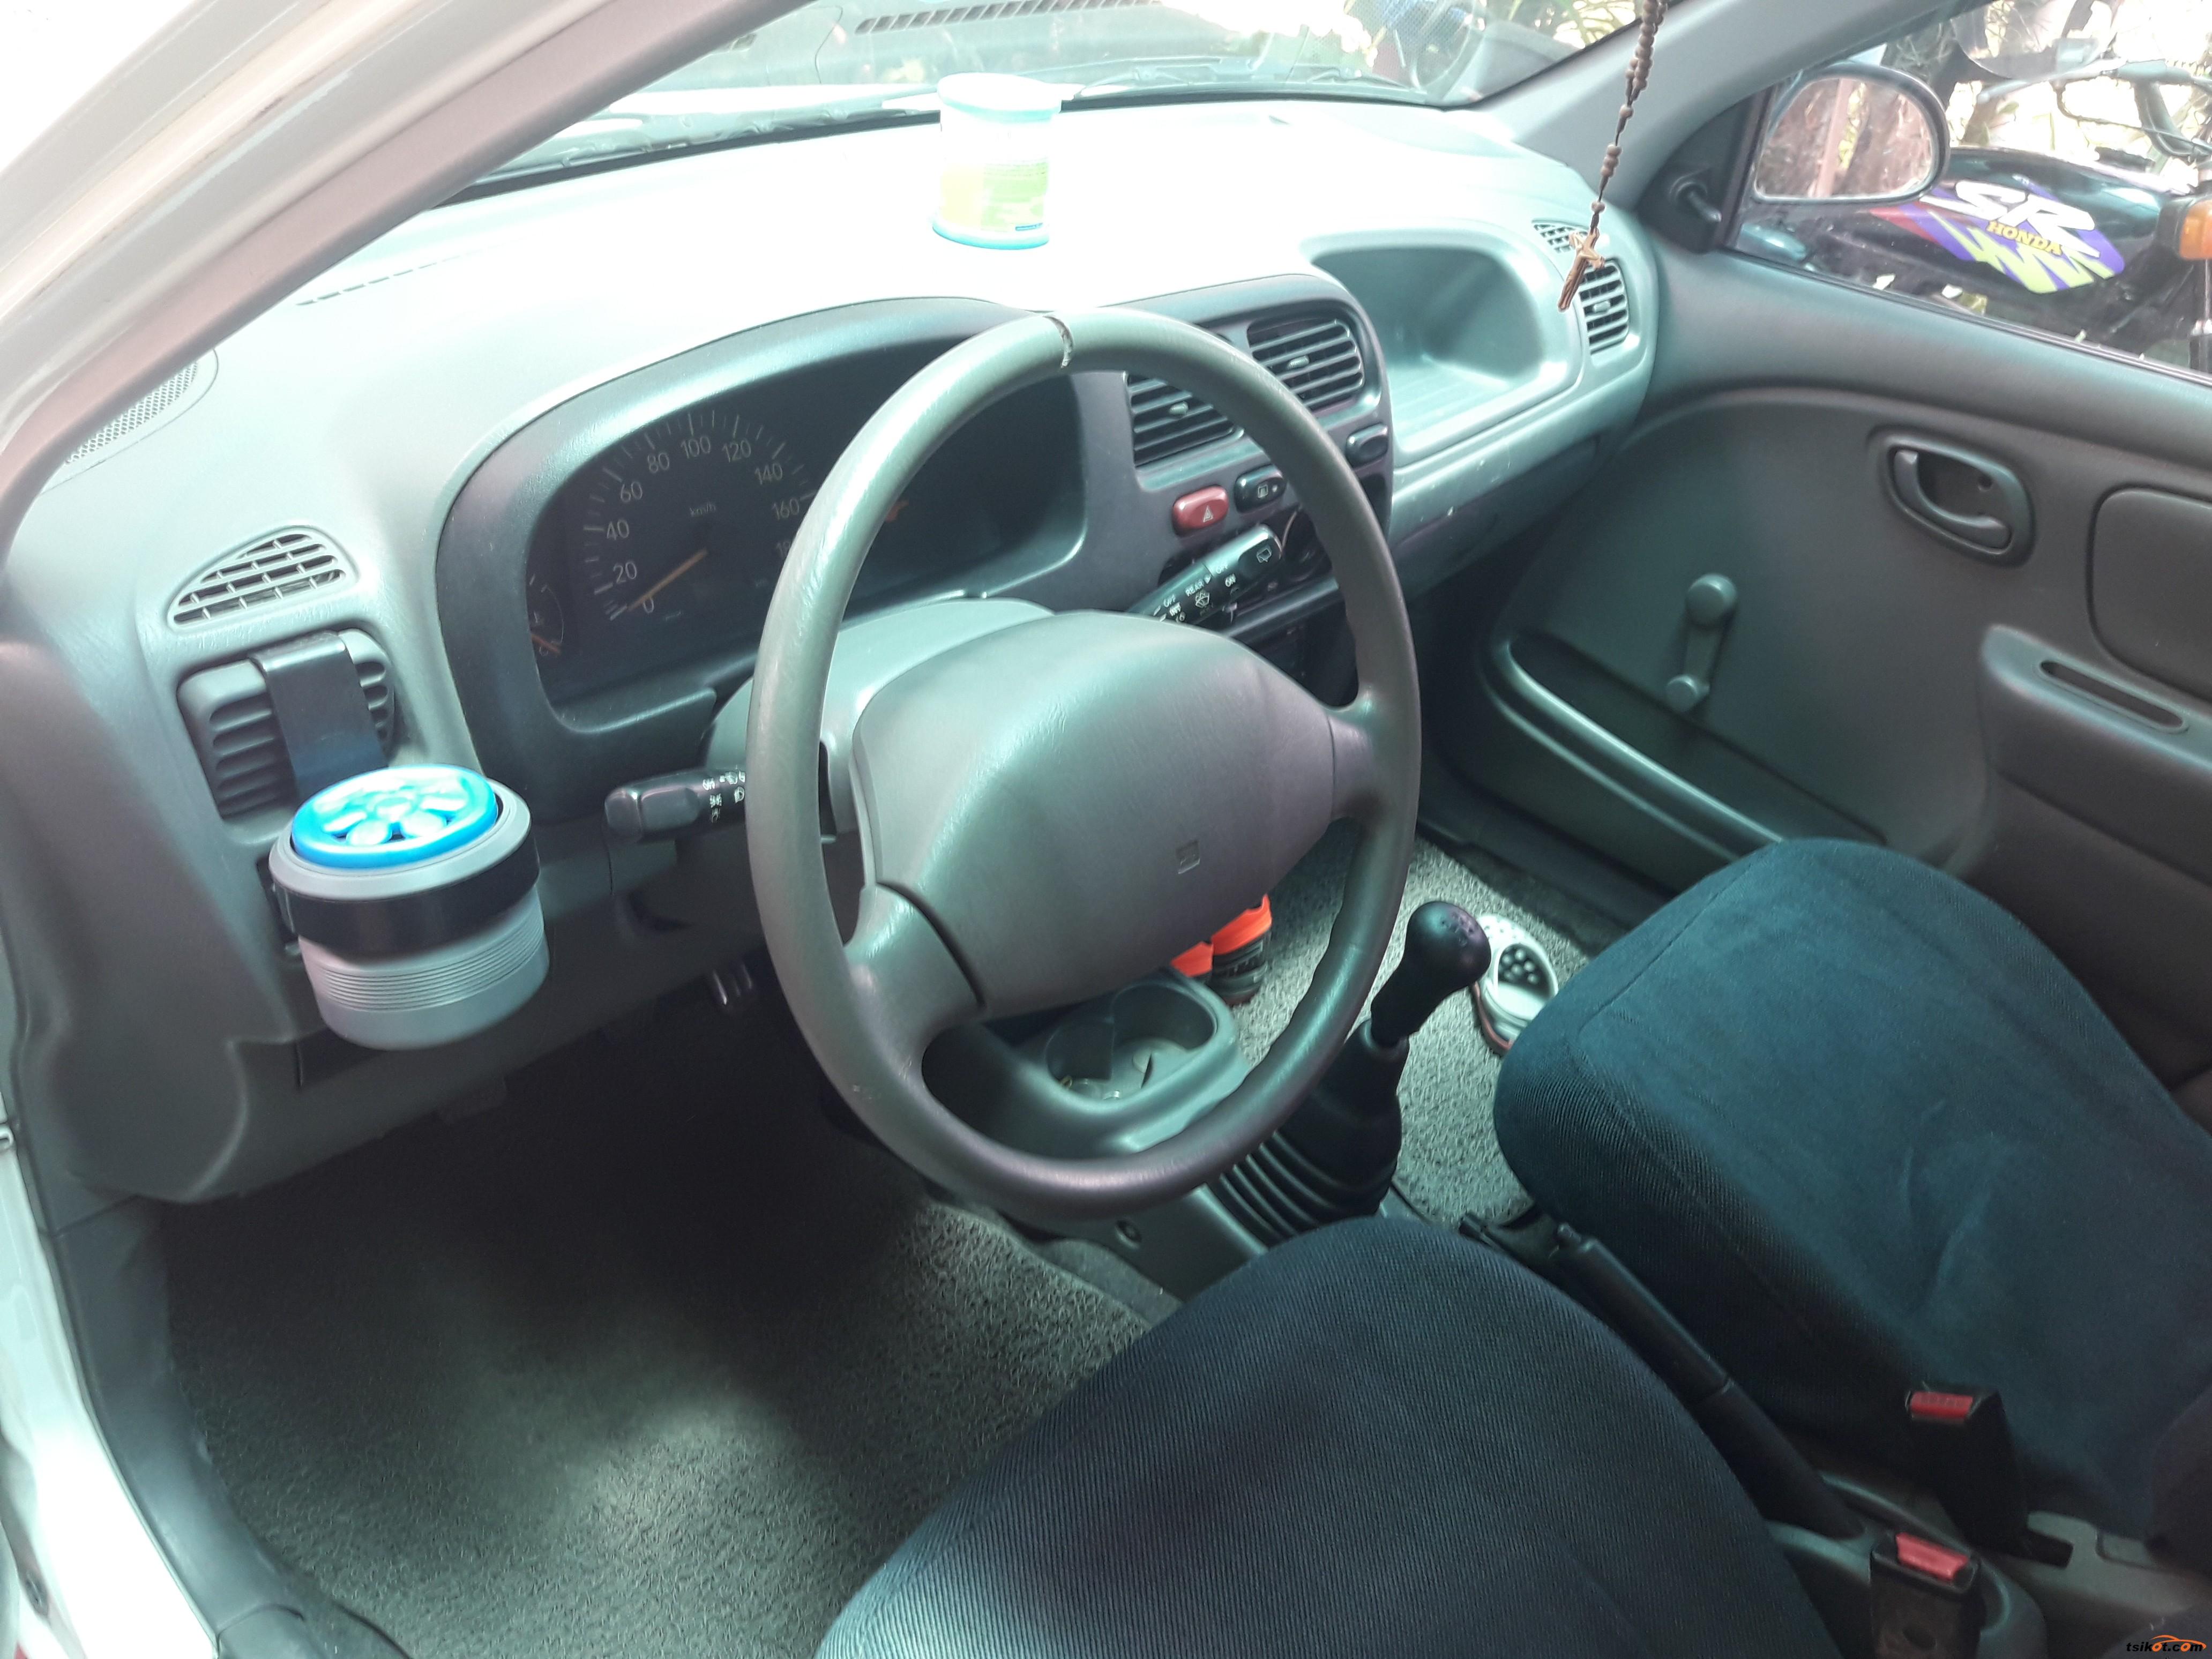 Suzuki Alto 2008 - 1